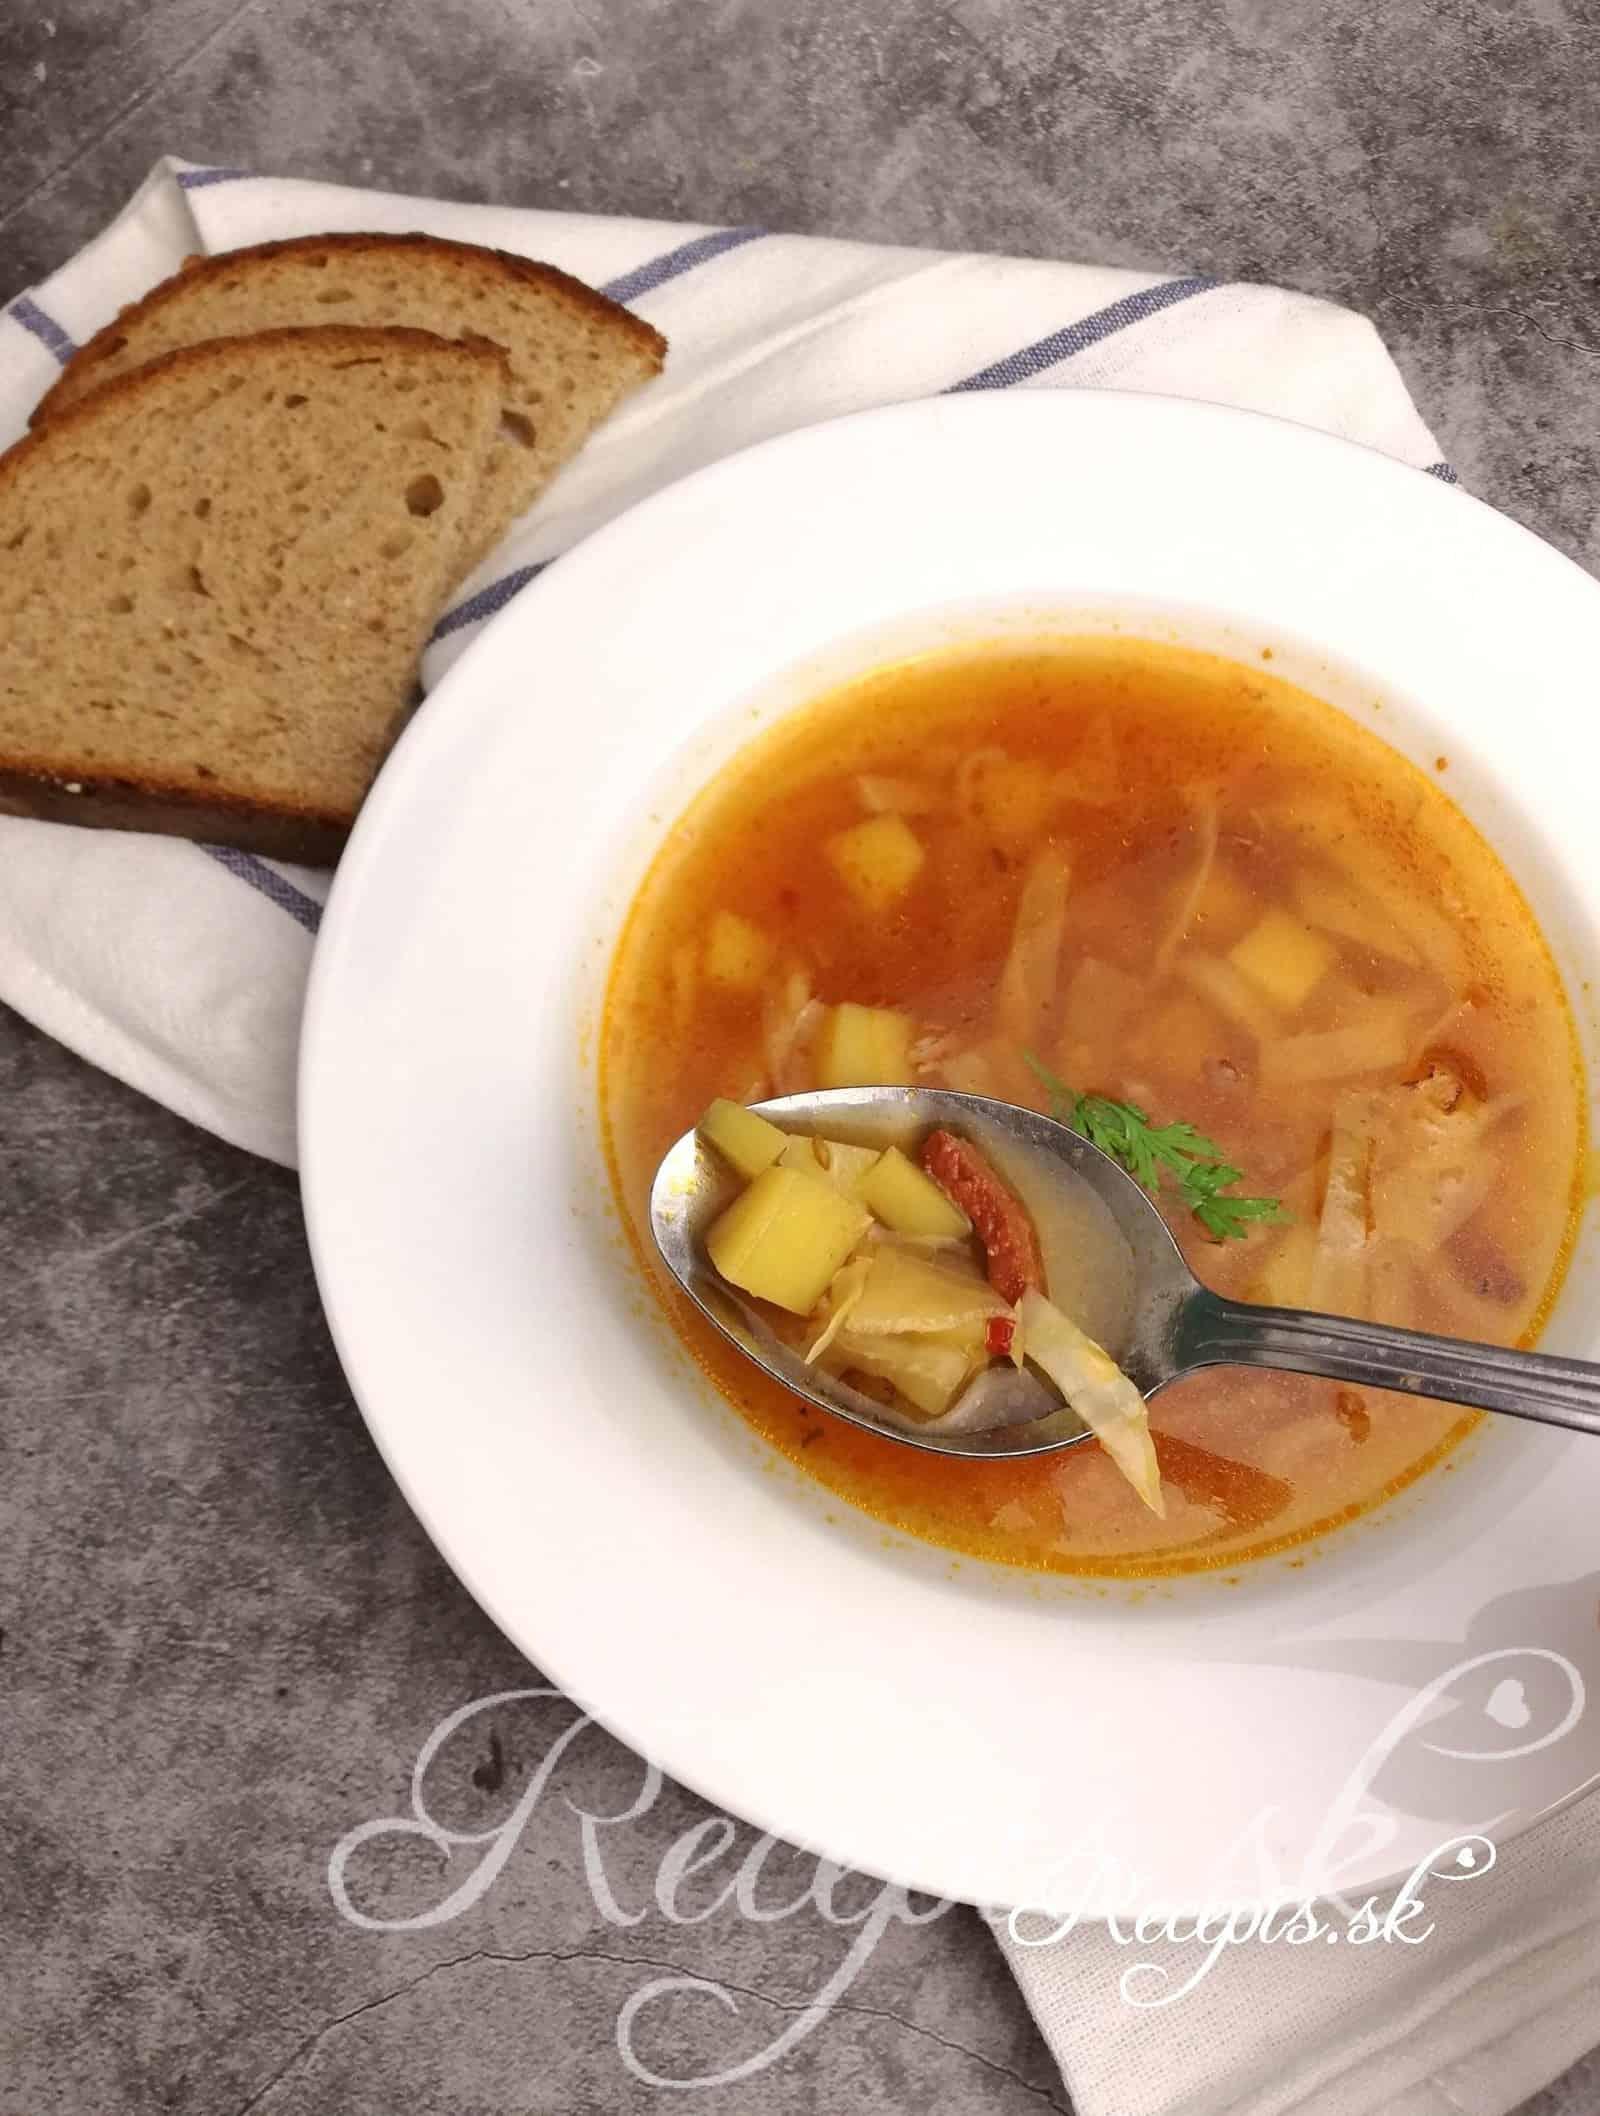 Kapustová polievka s rajčinovým pretlakom